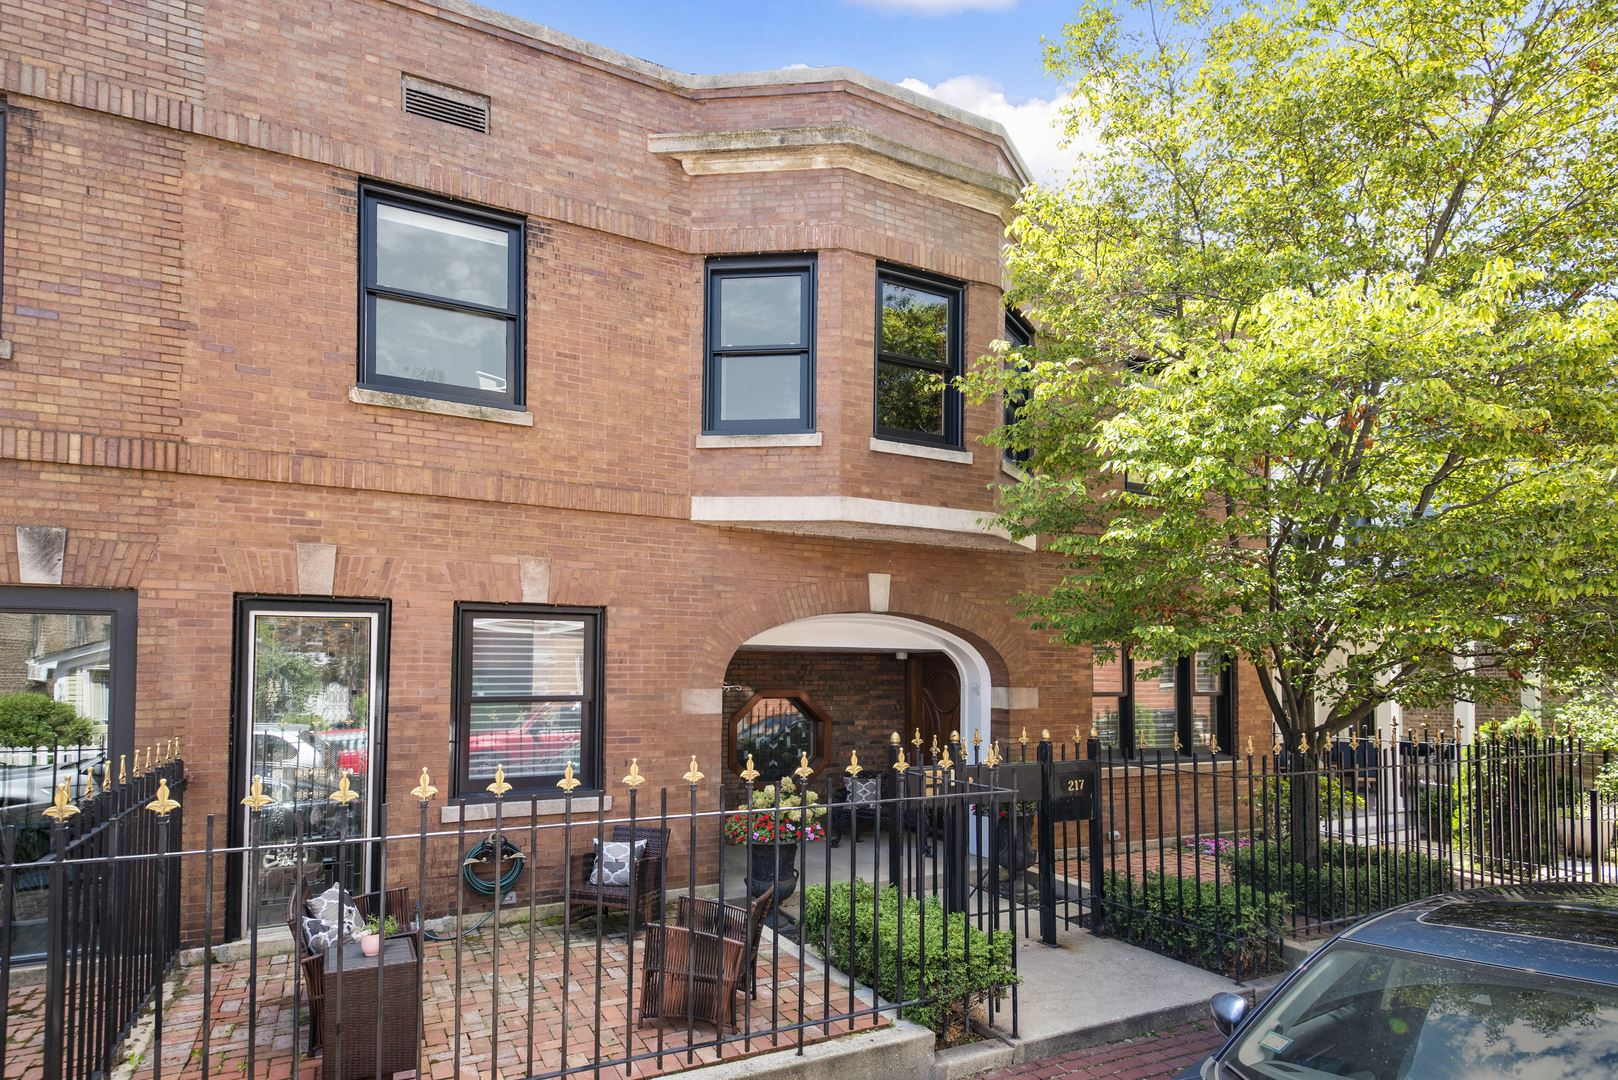 217 W MENOMONEE Street, Chicago, IL 60614 - MLS#: 10808648